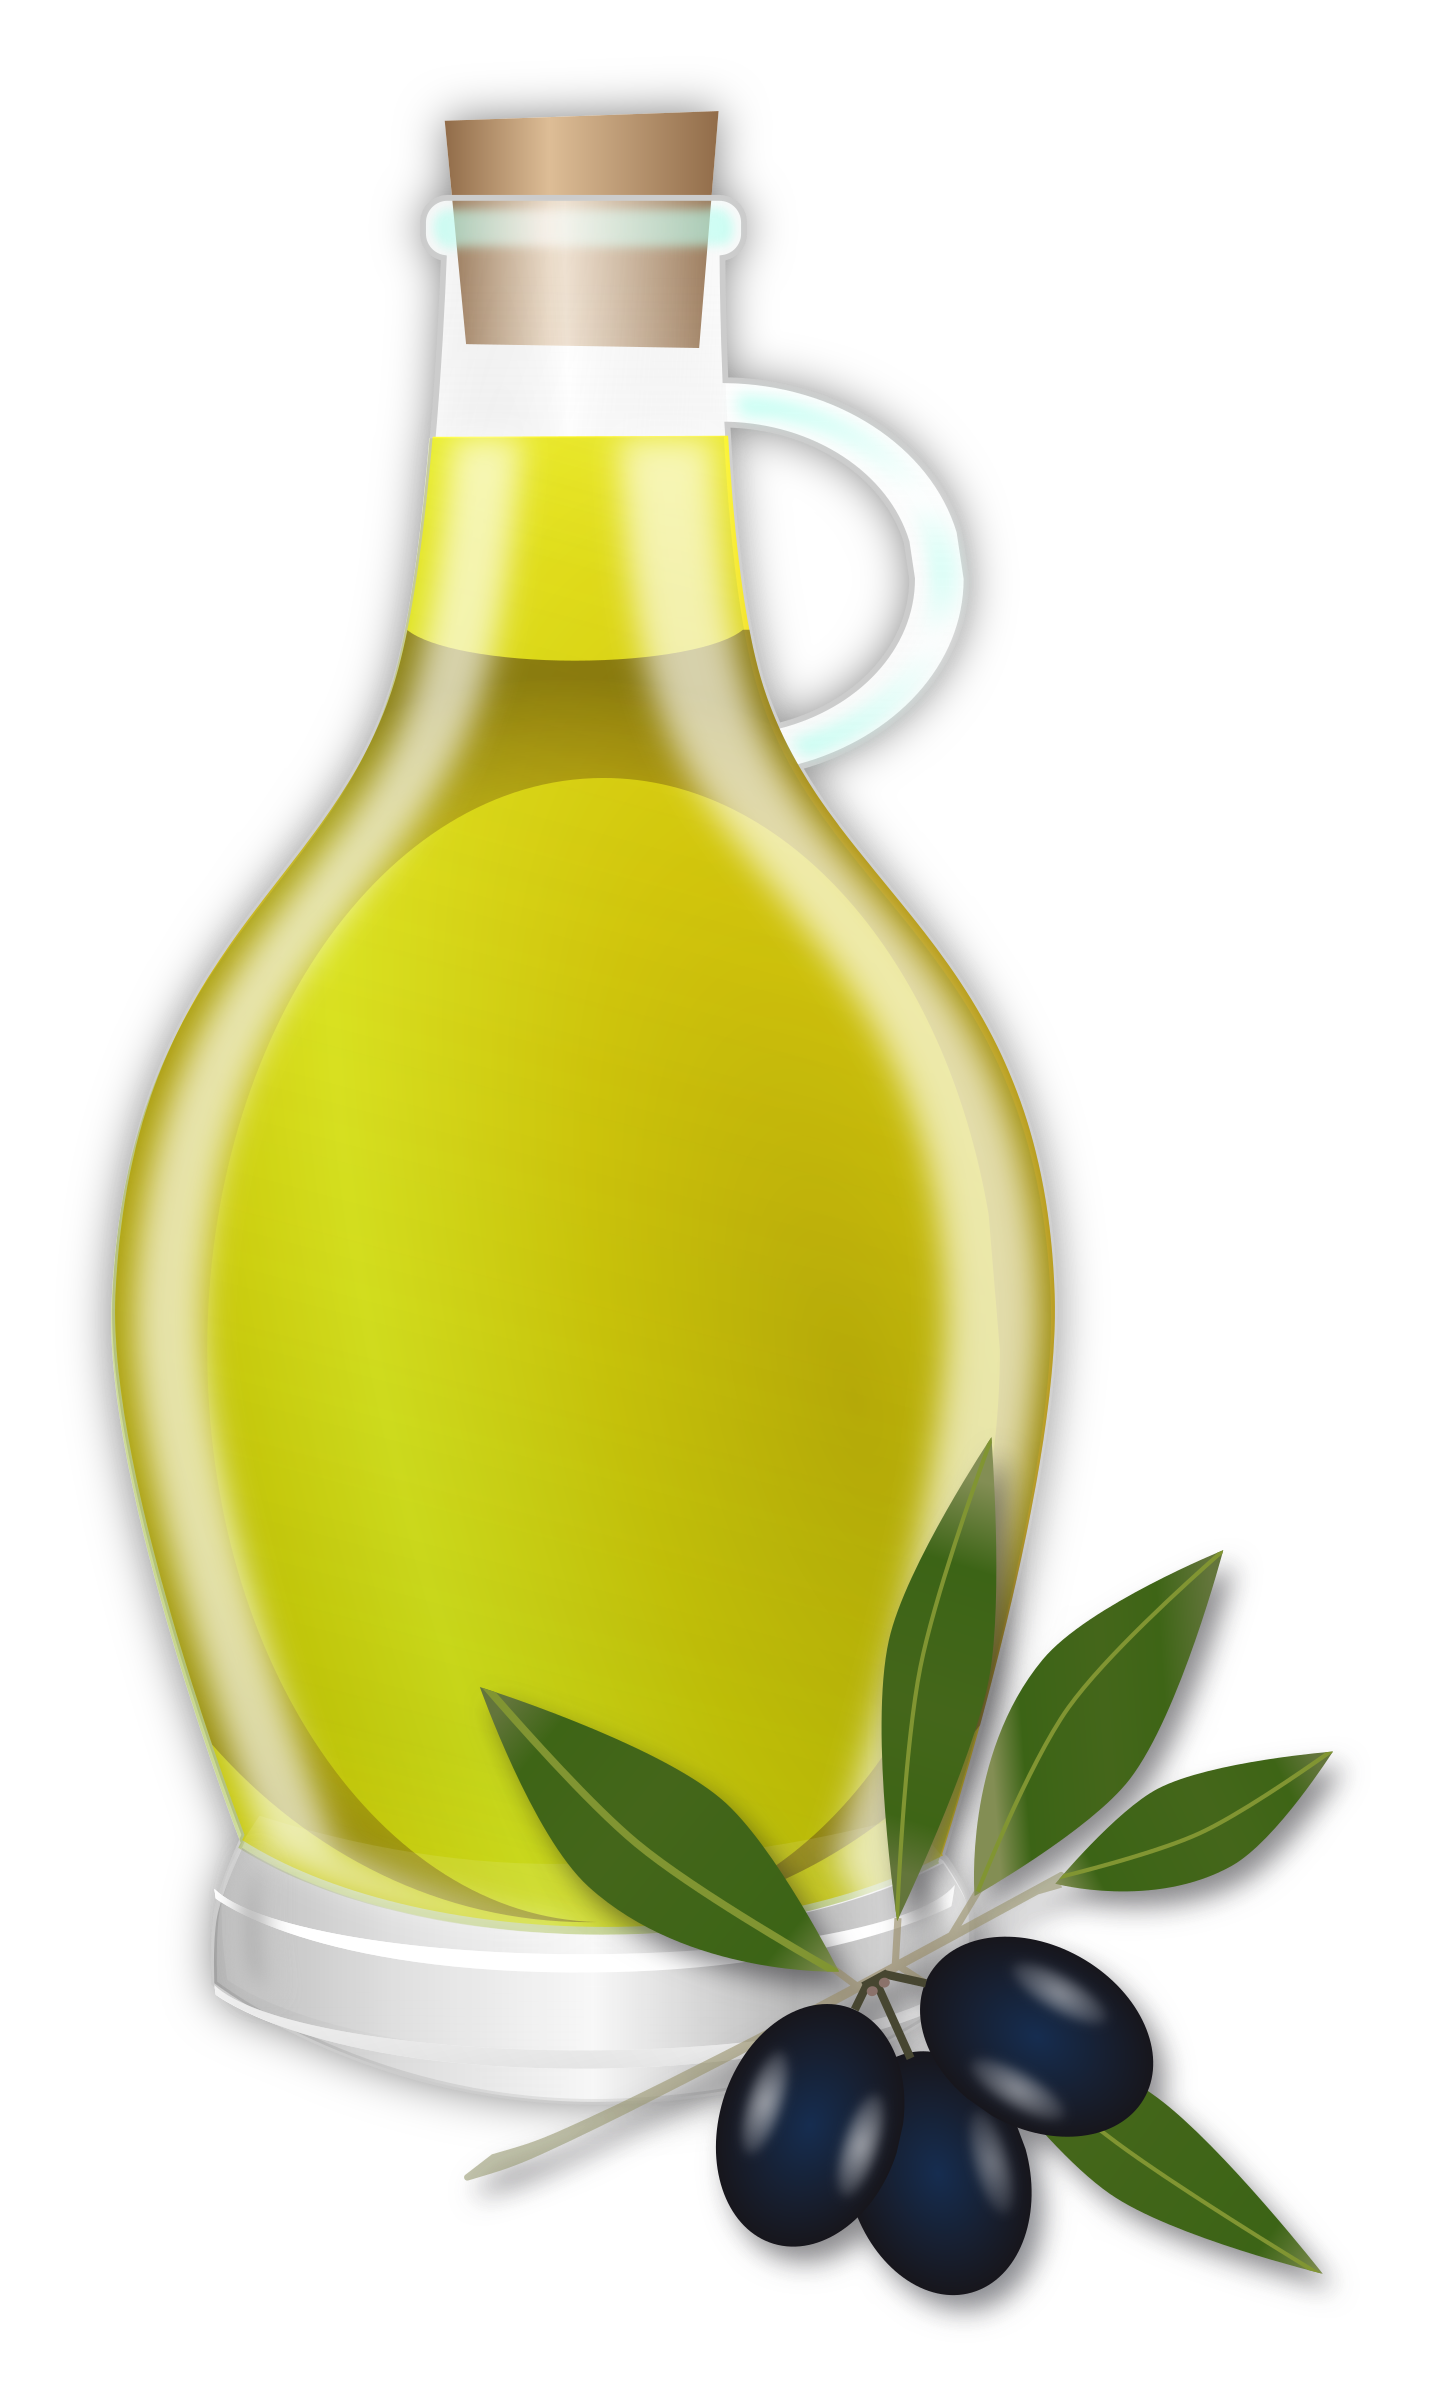 Olive Oil clipart Oil Olive Clipart Oil Olive